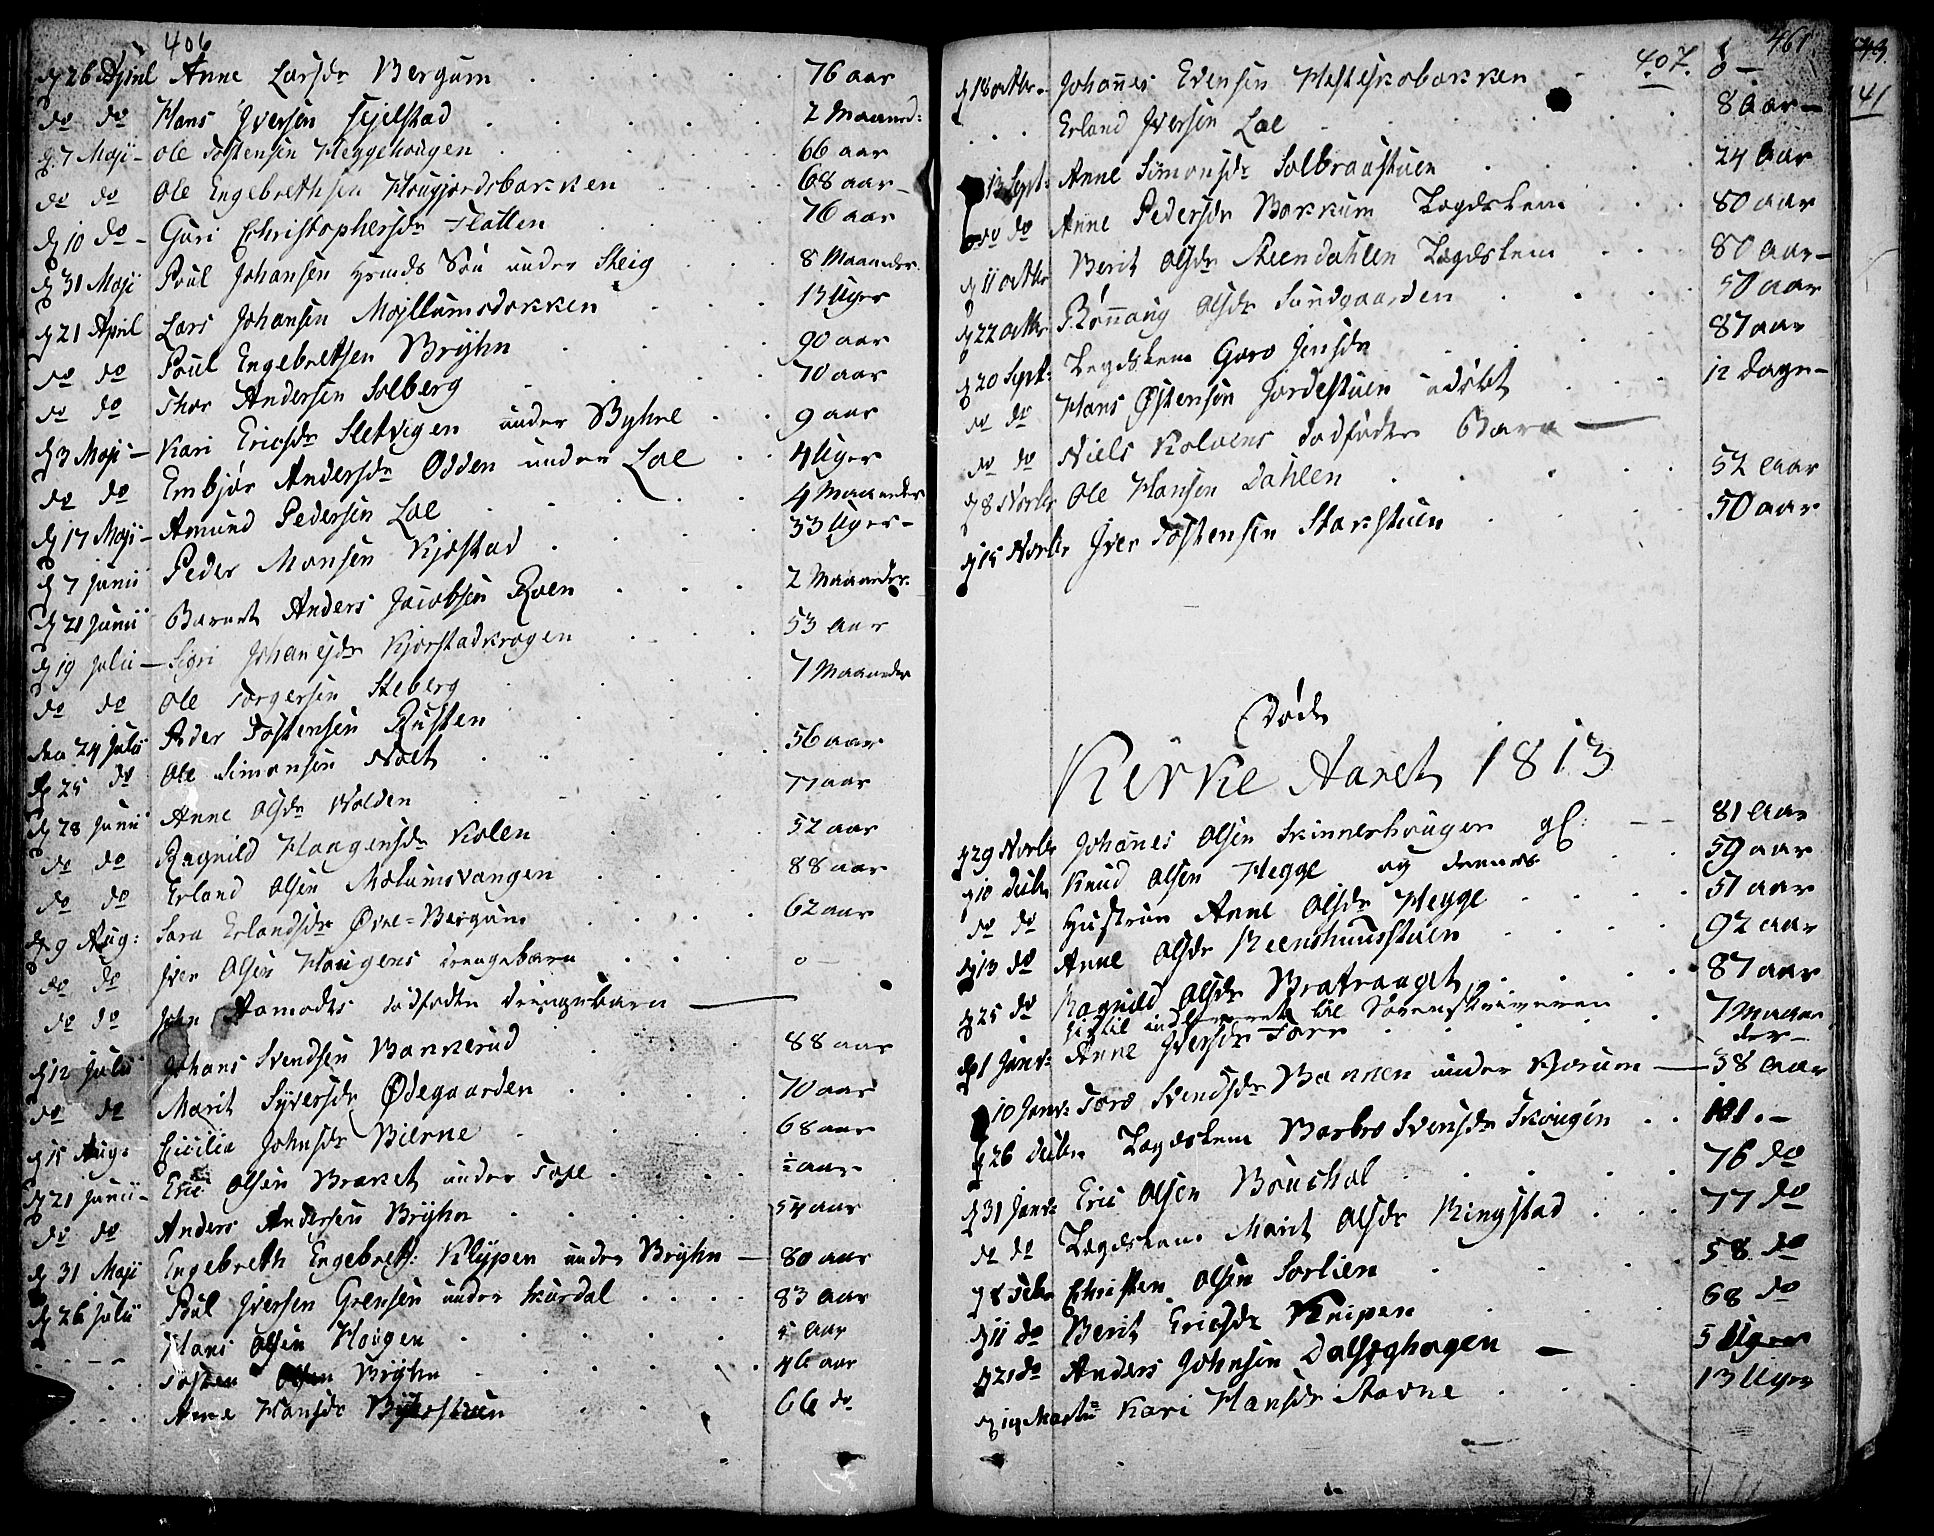 SAH, Fron prestekontor, H/Ha/Haa/L0001: Ministerialbok nr. 1, 1799-1816, s. 406-407